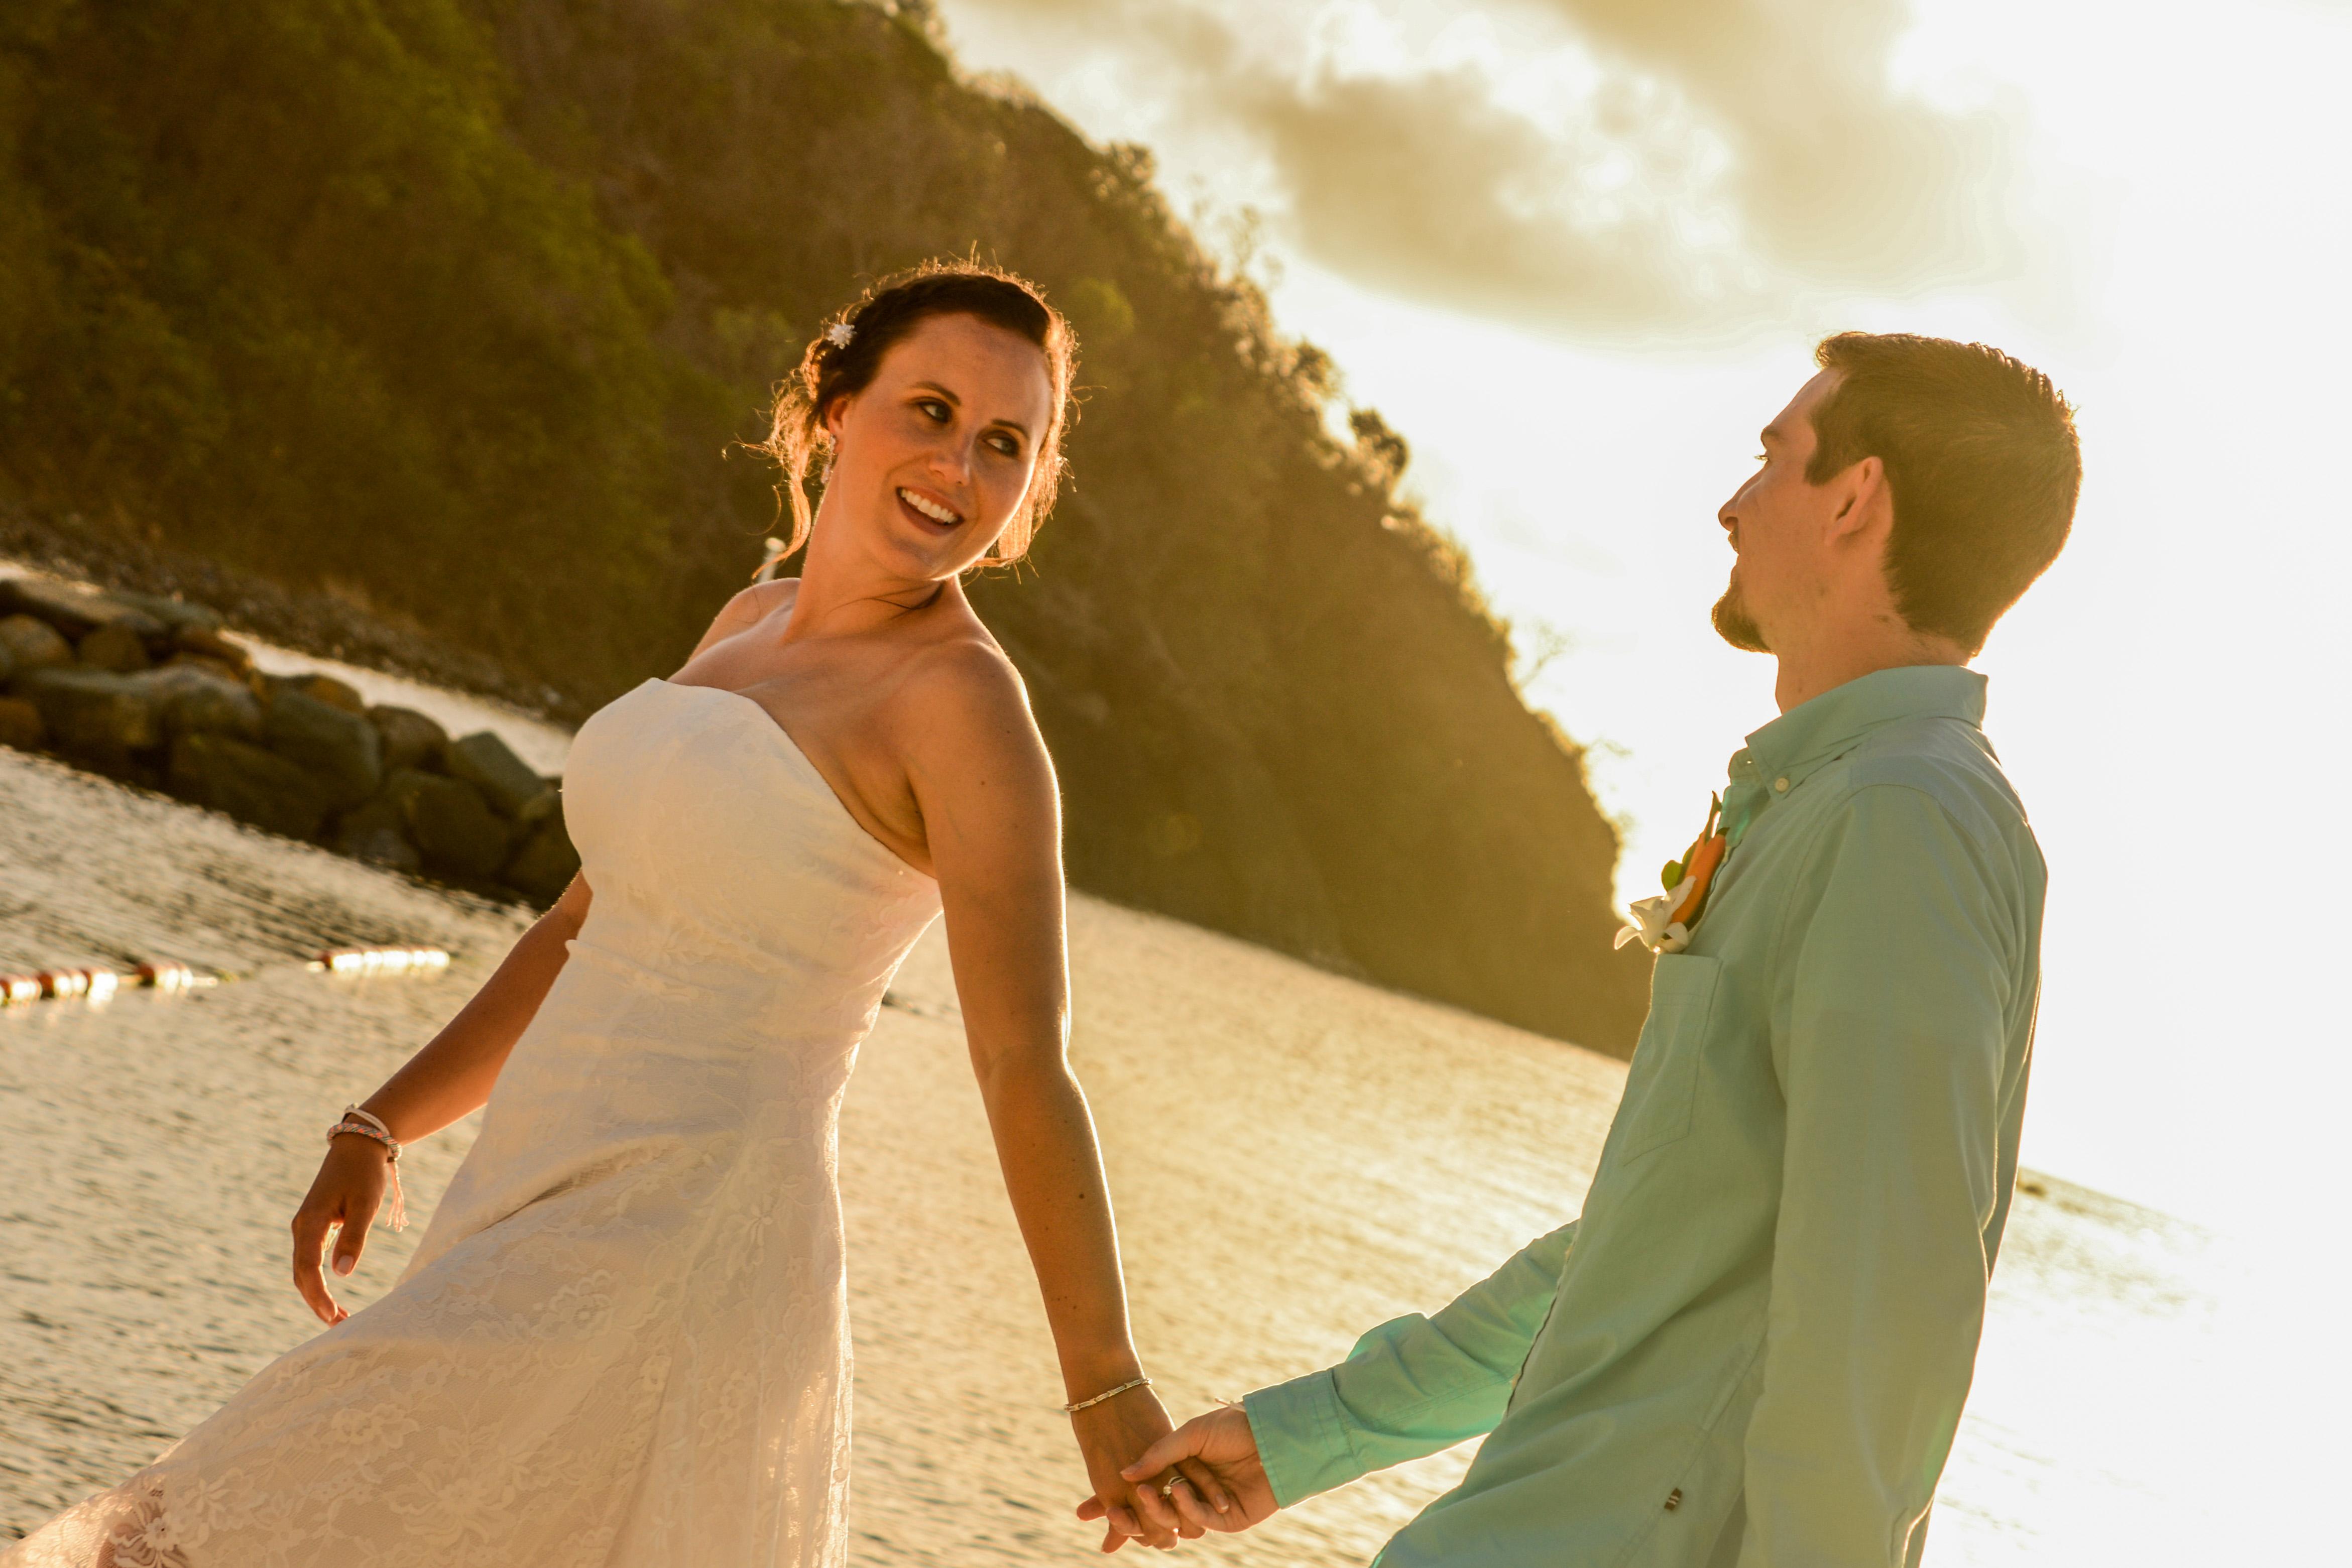 Destination Wedding Review.Perfect 10 Destination Wedding Review Royalton St Lucia Bliss